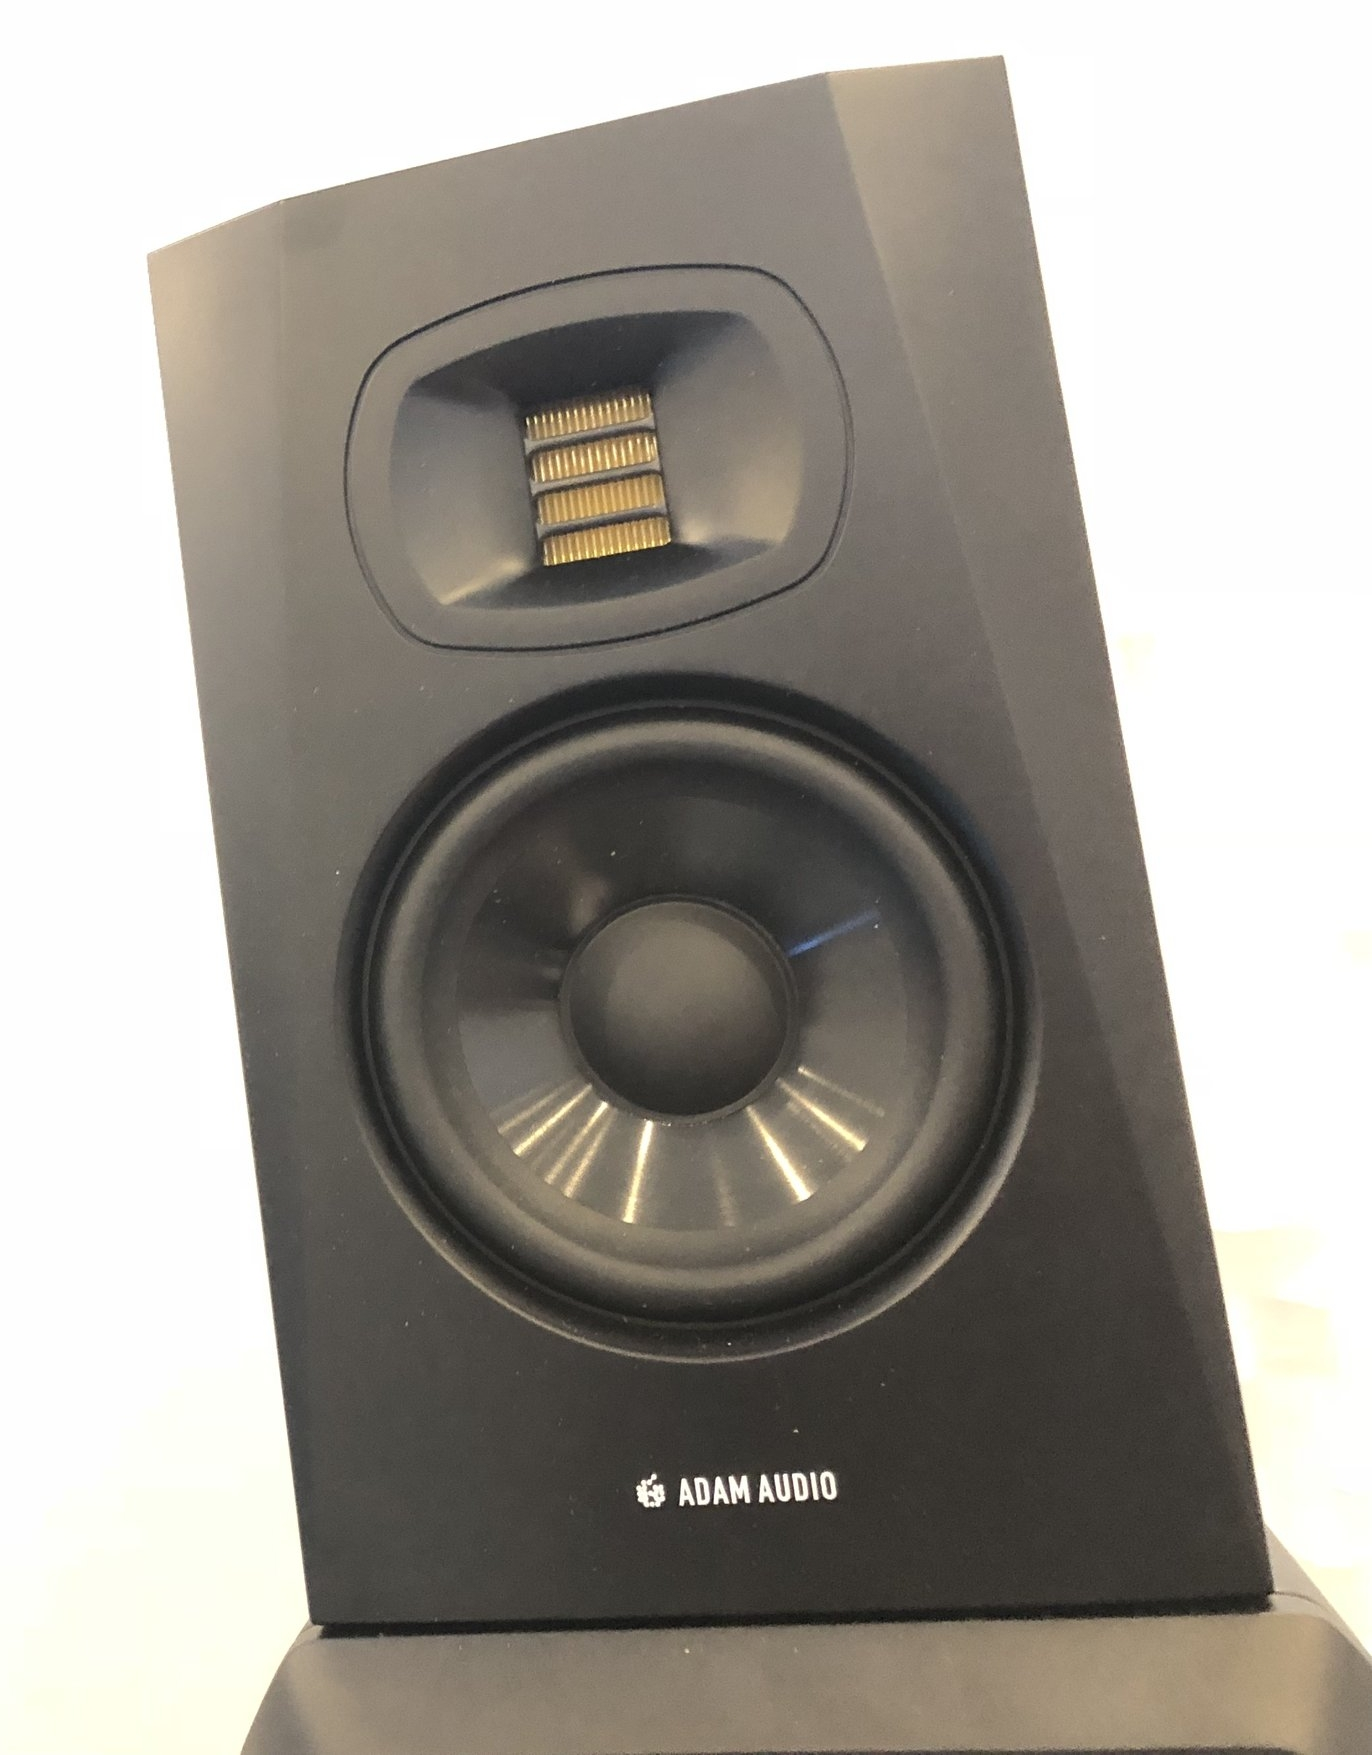 ADAM Audio t series t5v low cost studio monitors review.jpg